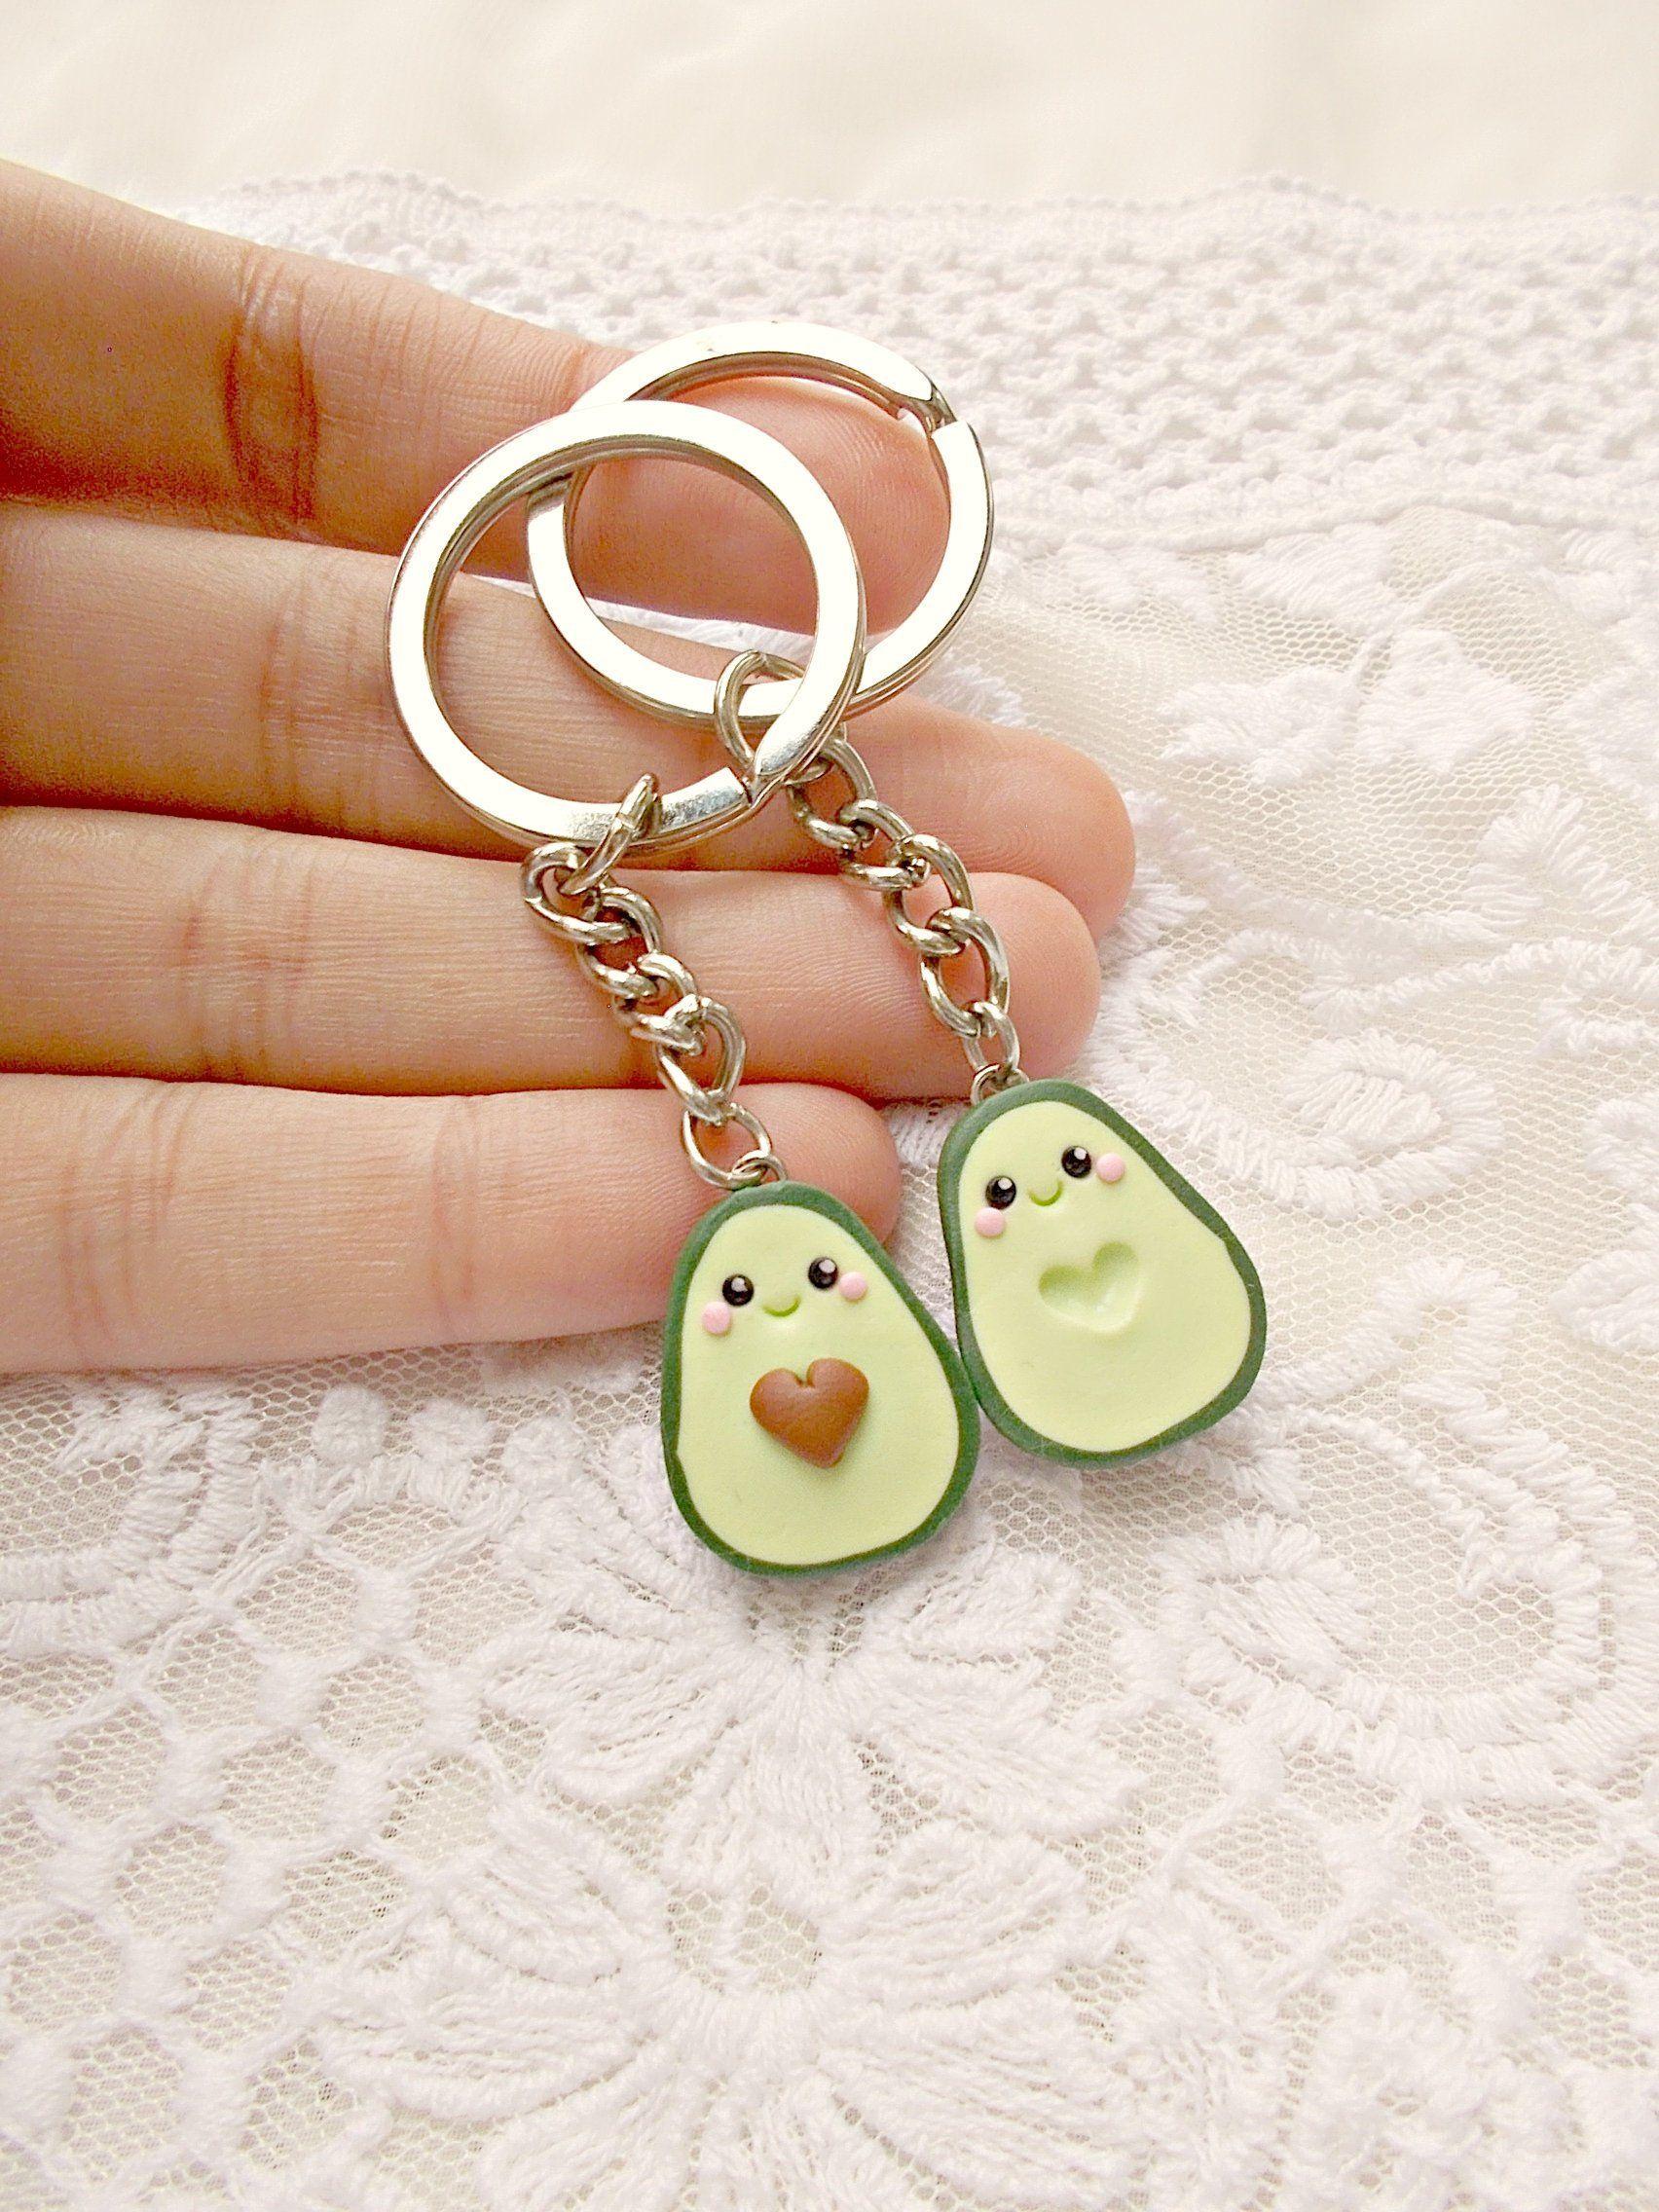 Beste Freundin Geschenke - Avocado Muttertag Geschenk Avocado Schlüsselanhänger Set - Freund Freundin Geschenk - Geschenk für beste Freunde